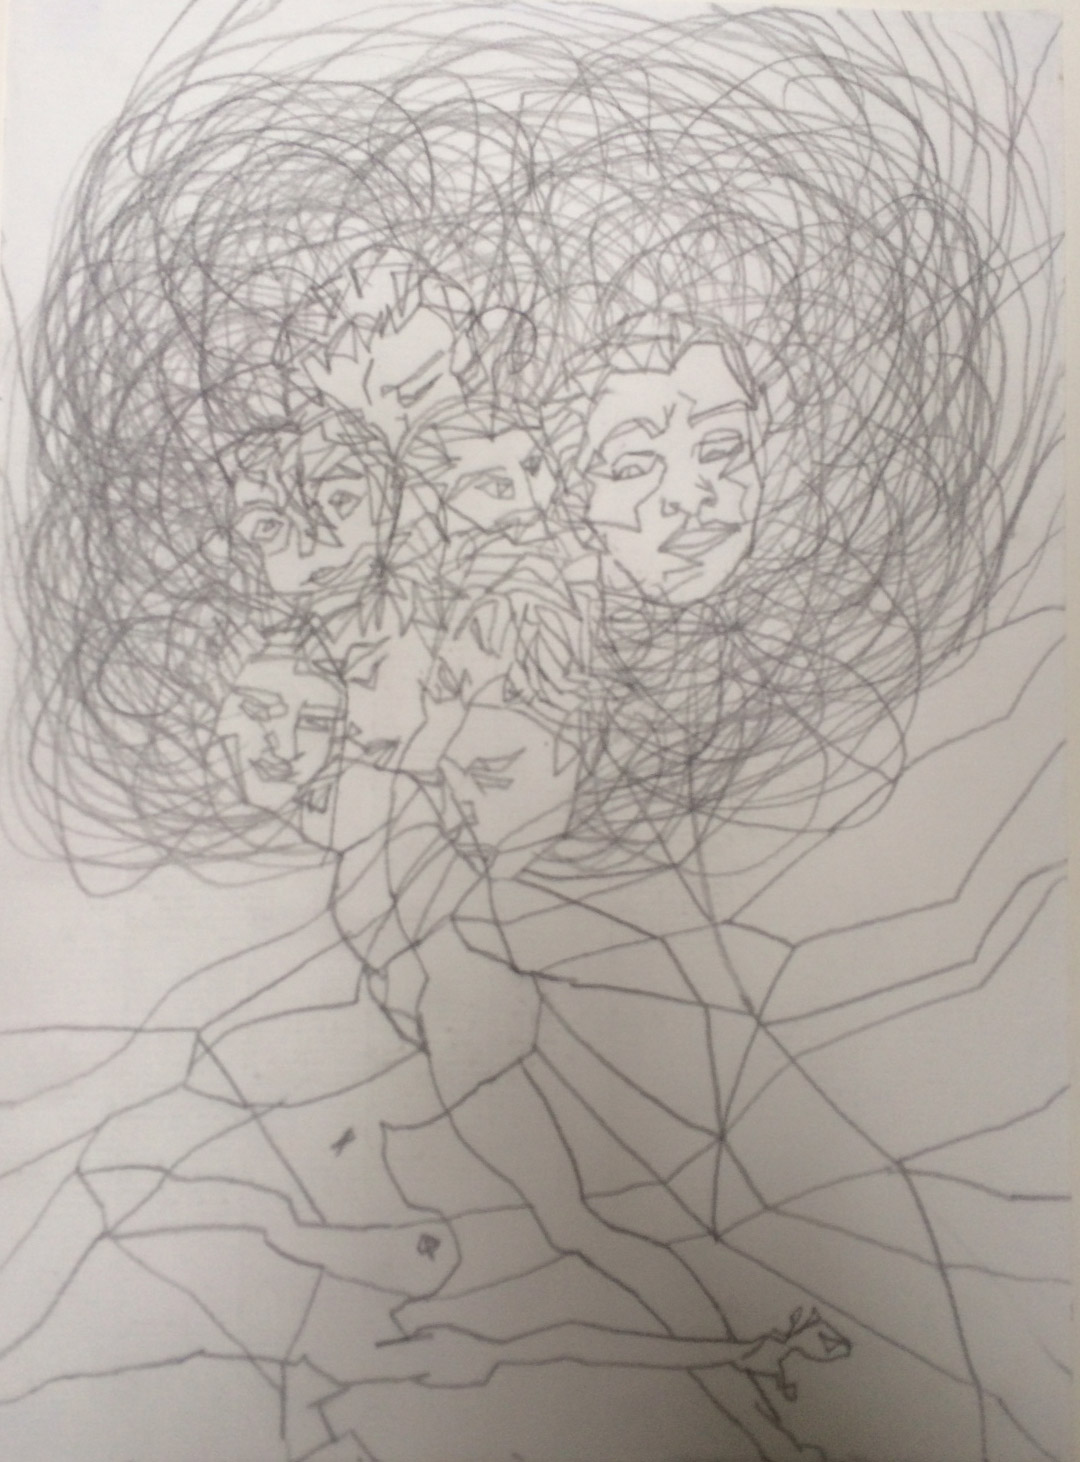 PENCIL ON PAPER | 20,8 x 28,5 CM